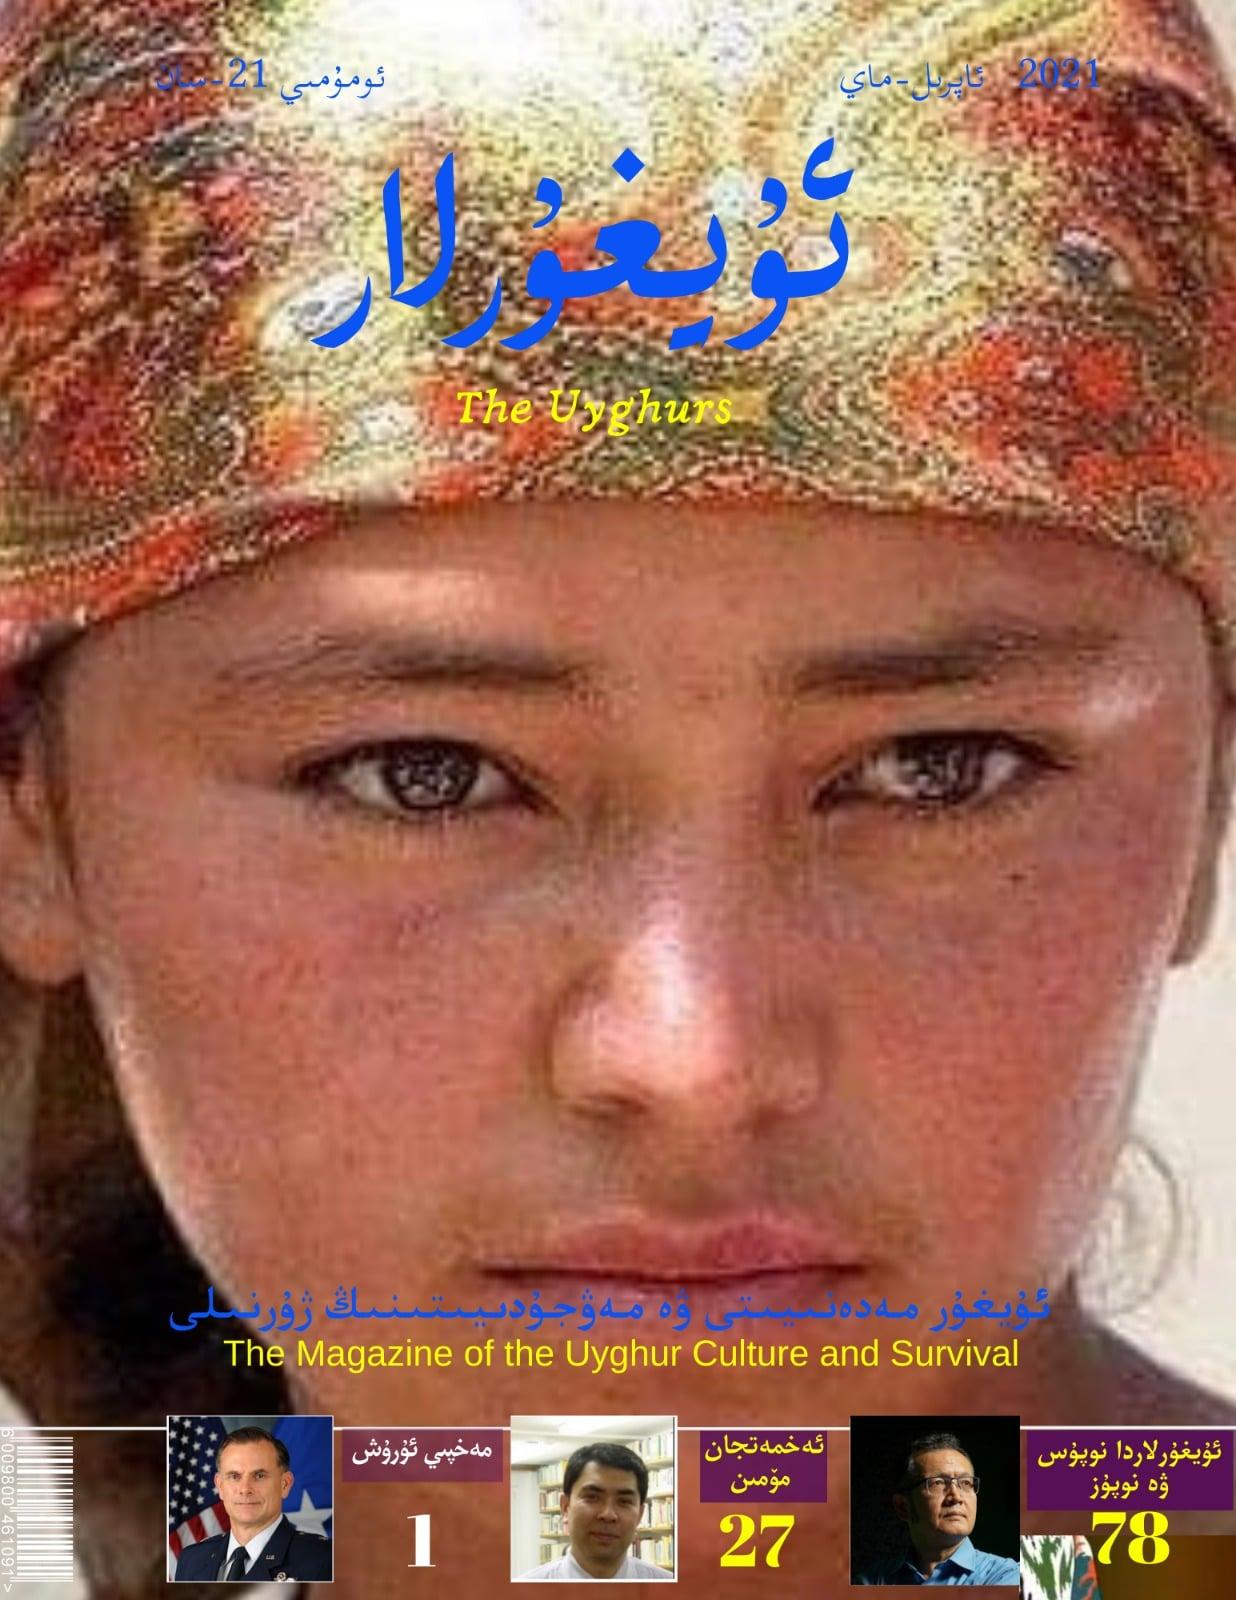 Uyghur21 - ئۇيغۇرلار 2021 ئاپرىل-ماي ئومۇمىي 21-سان